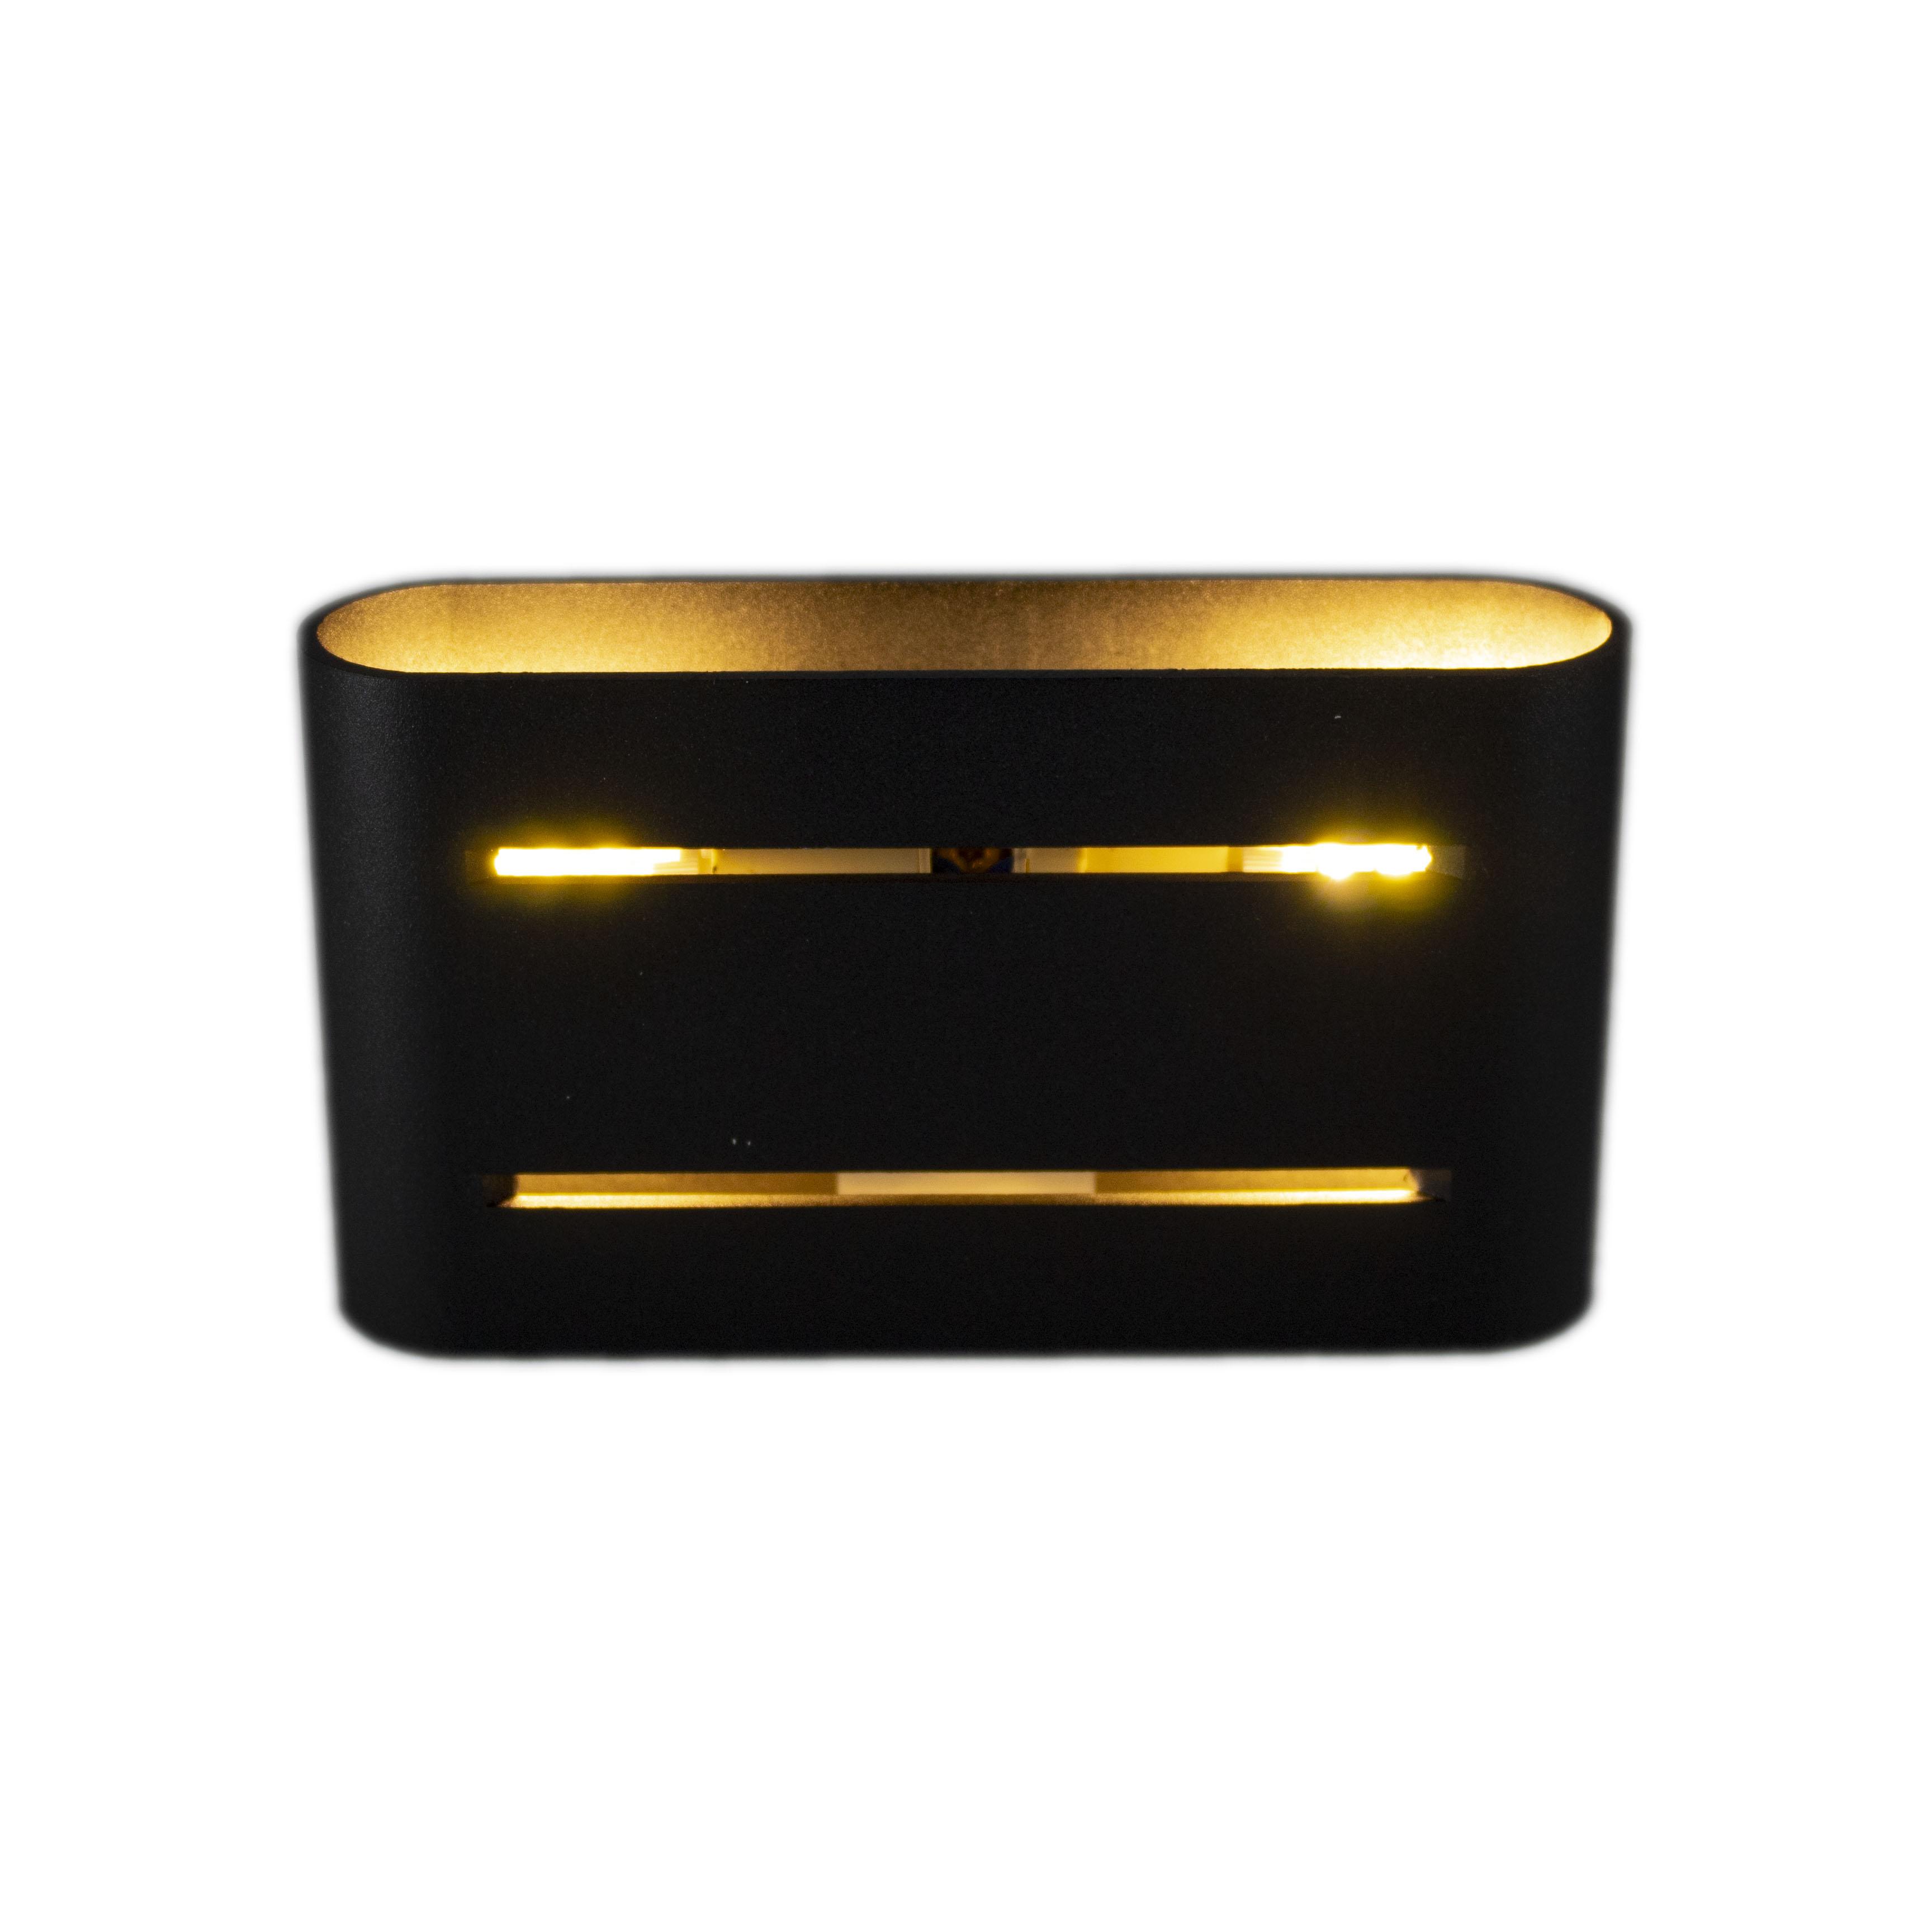 Led wandlamp zwart goud 2 keer G9 fitting - ip20 - vooraanzicht lamp aan